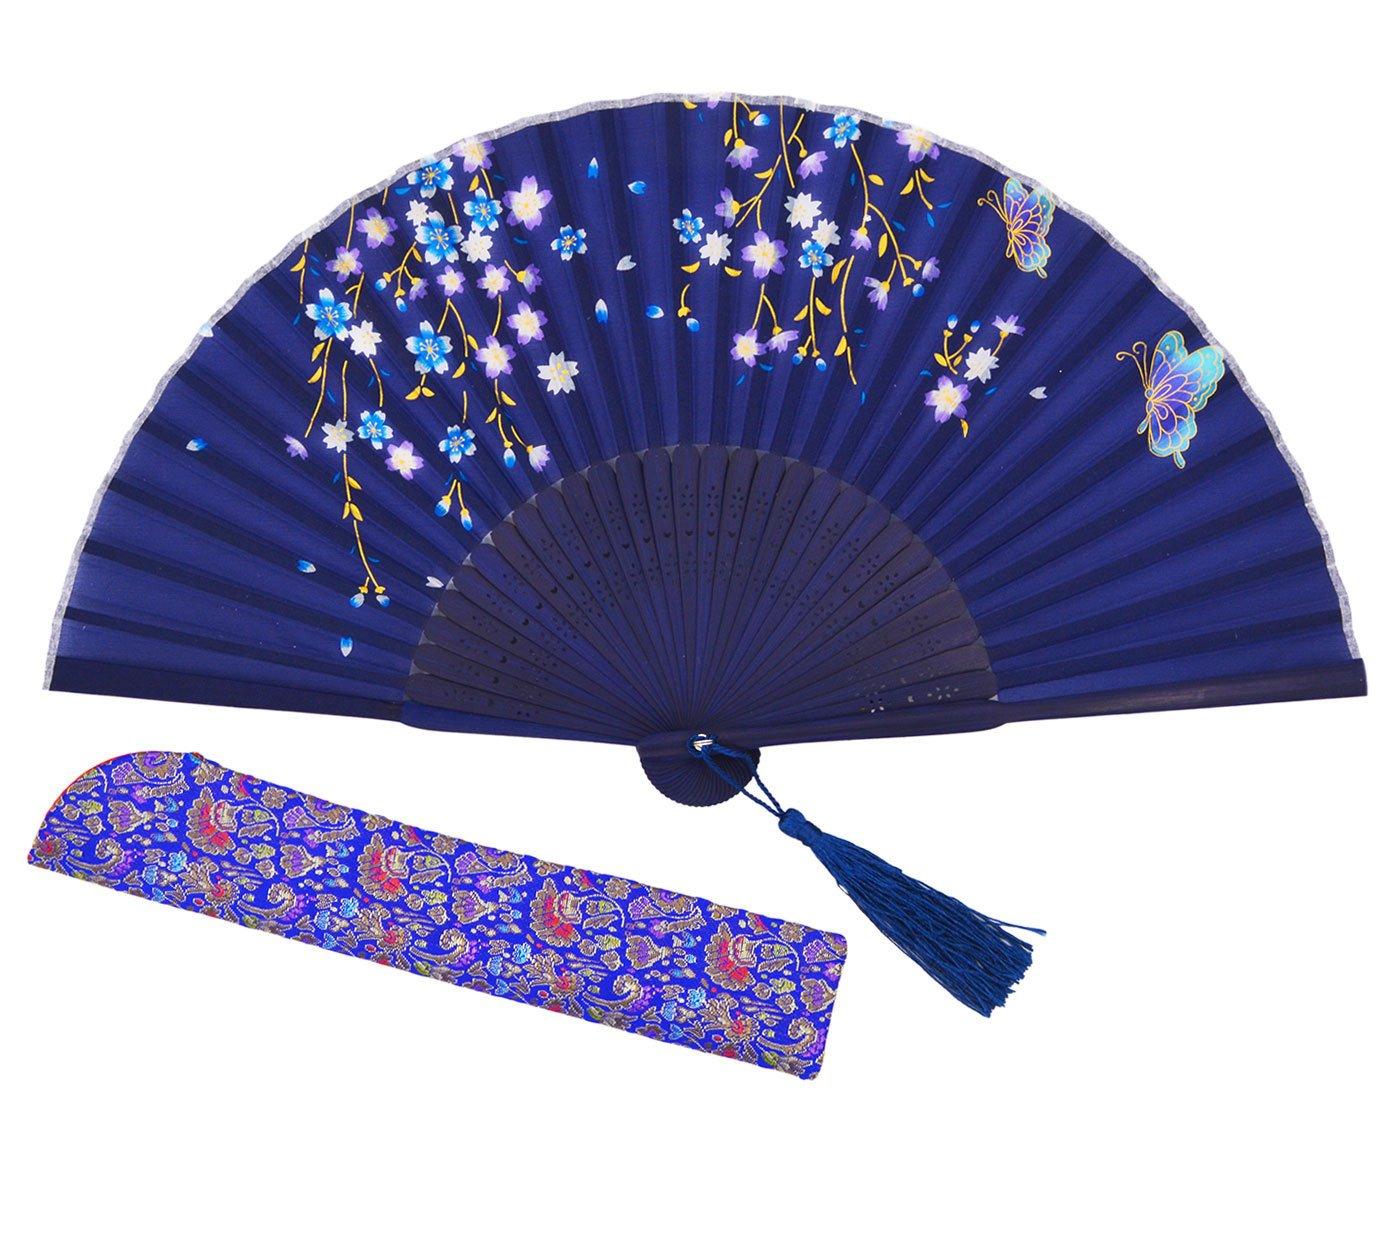 Meifan Chinese/Japanese Vintage Retro Style Handheld Folding Fan FML (Blue)